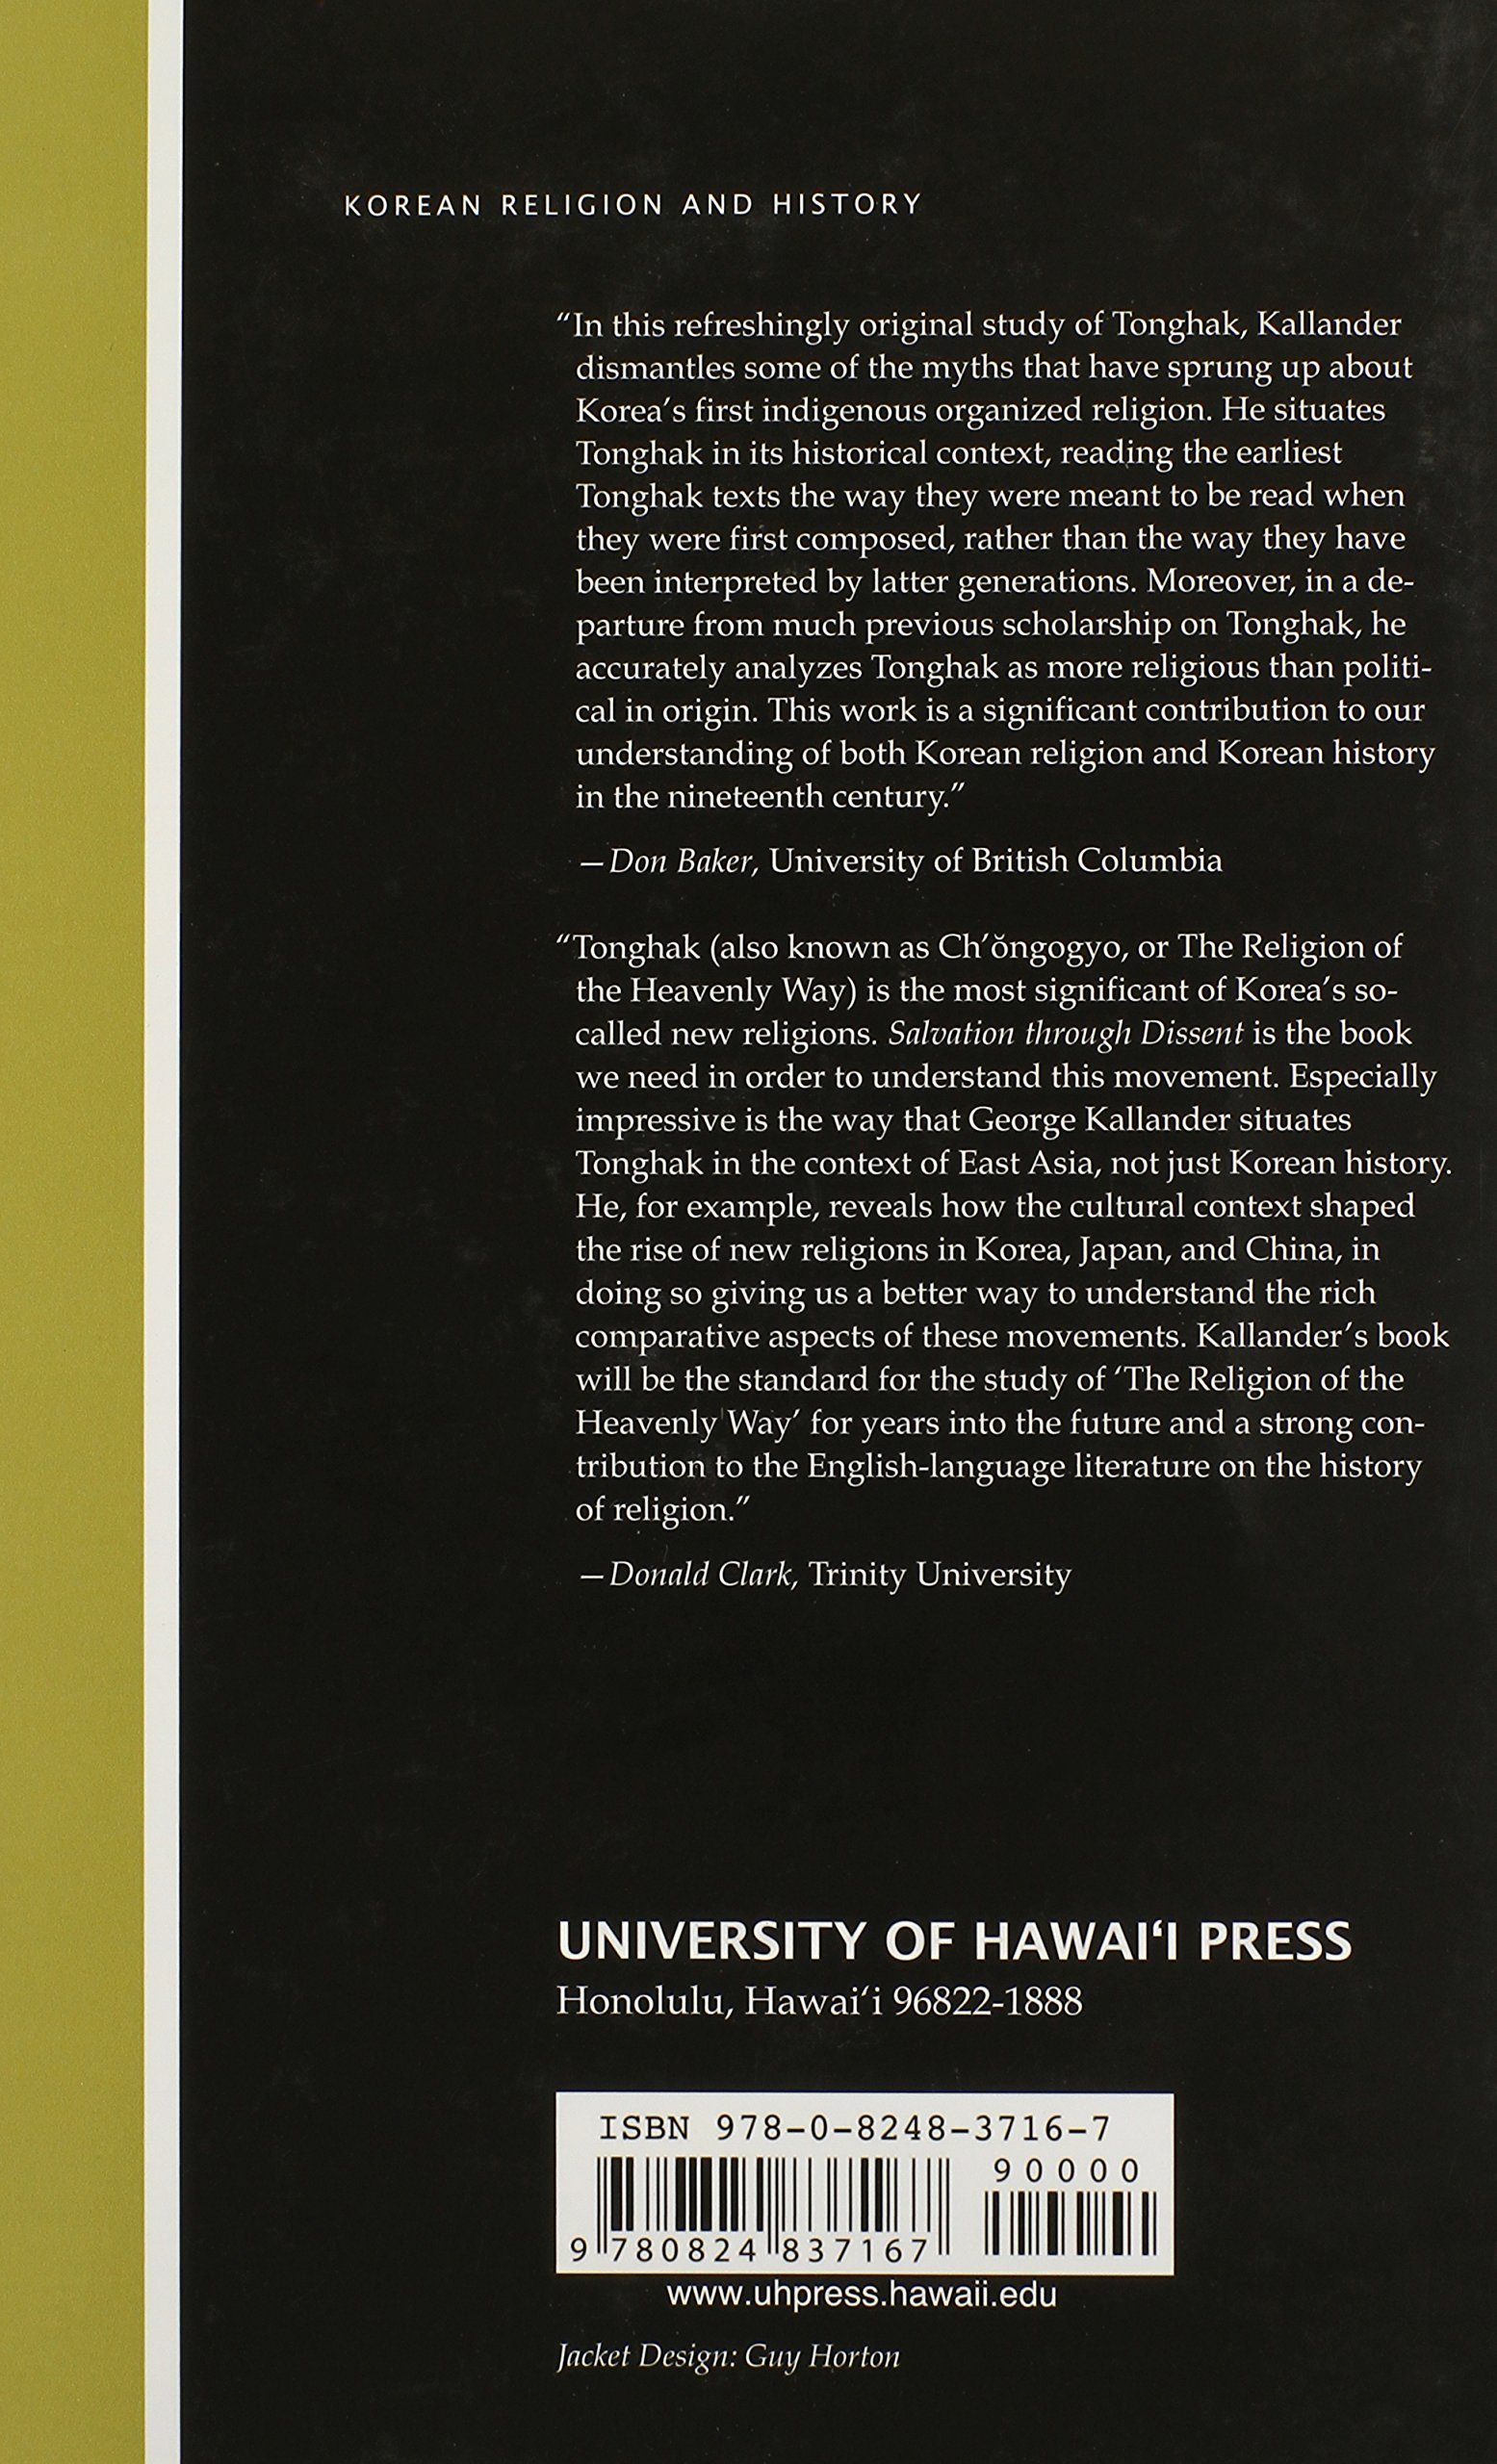 Salvation through Dissent: Tonghak Heterodoxy and Early Modern Korea  (Korean Classics Library: Philosophy and Religion): George L. Kallander, ...